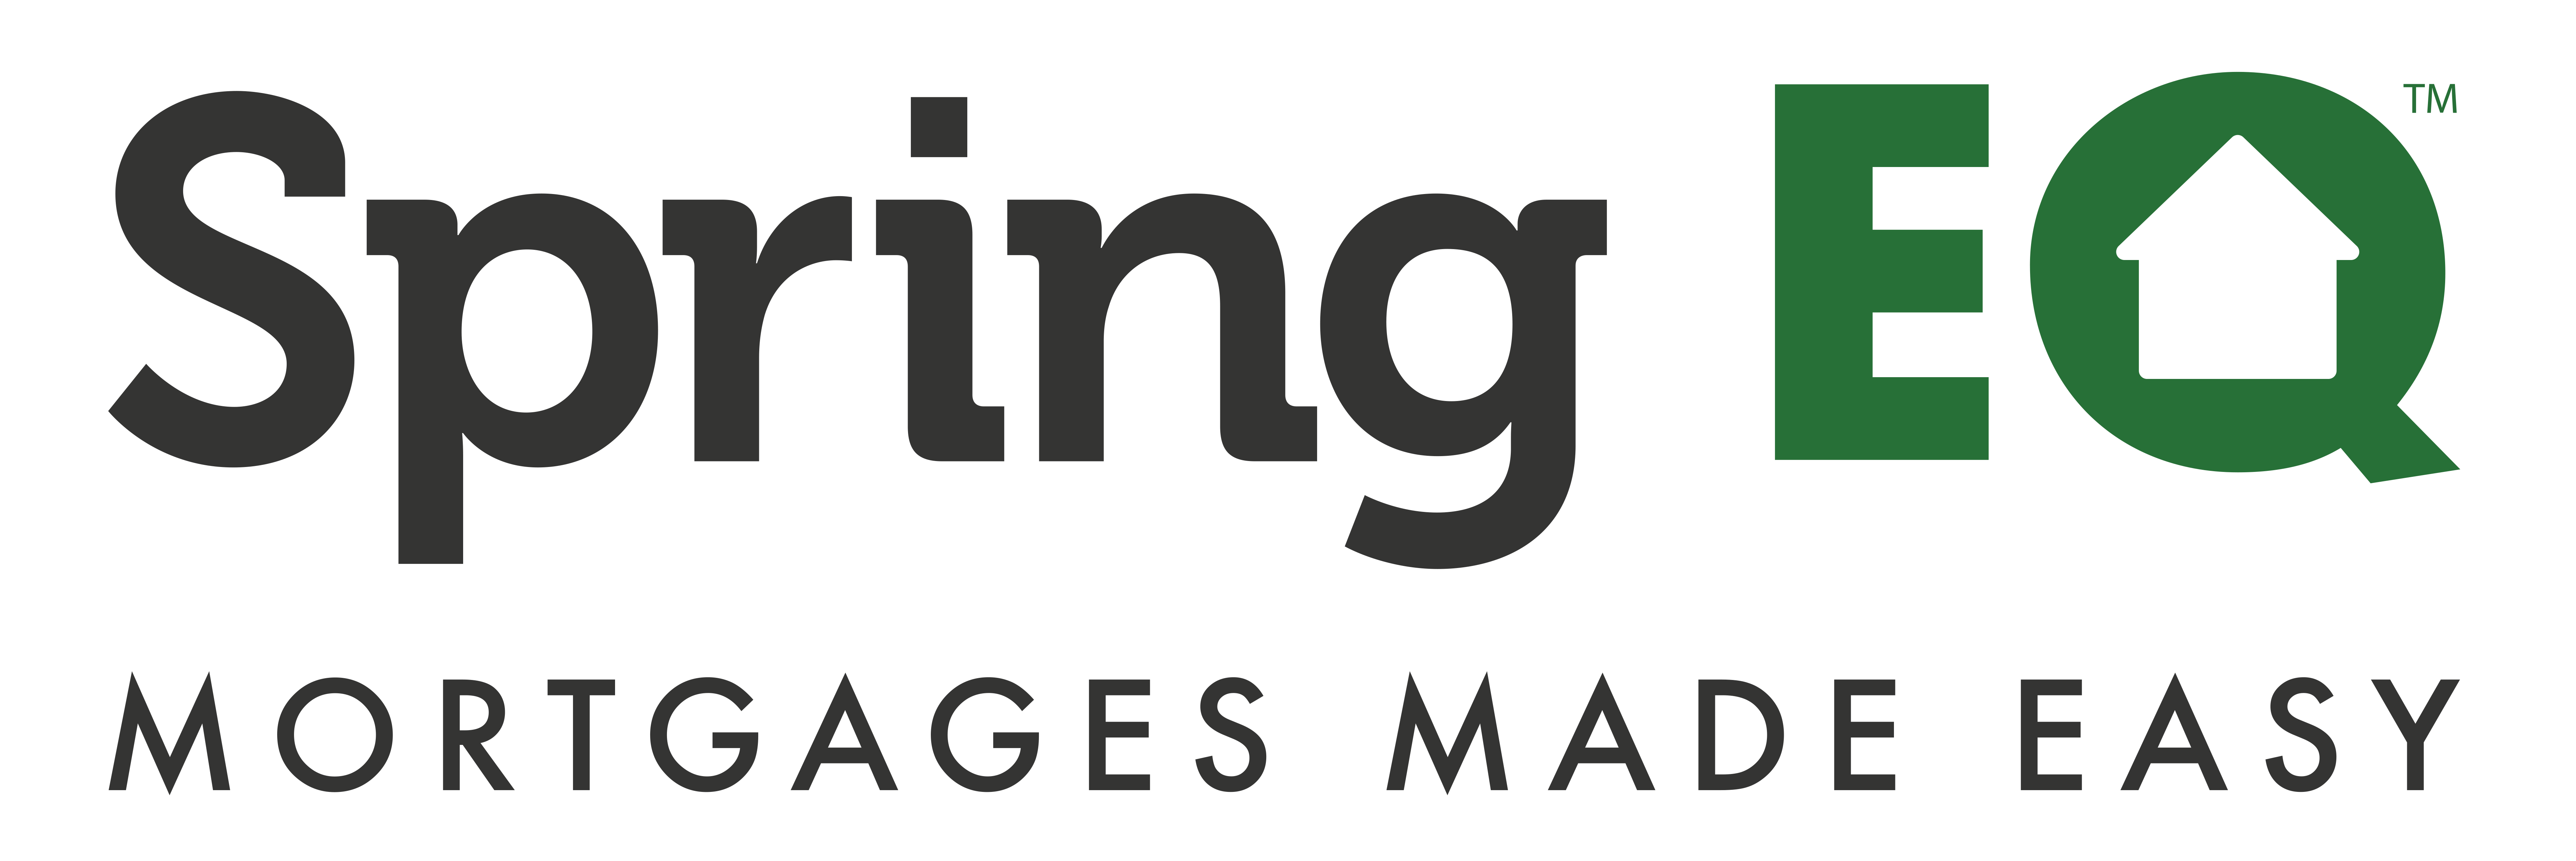 SEQ Mortgages made easy Logo-2